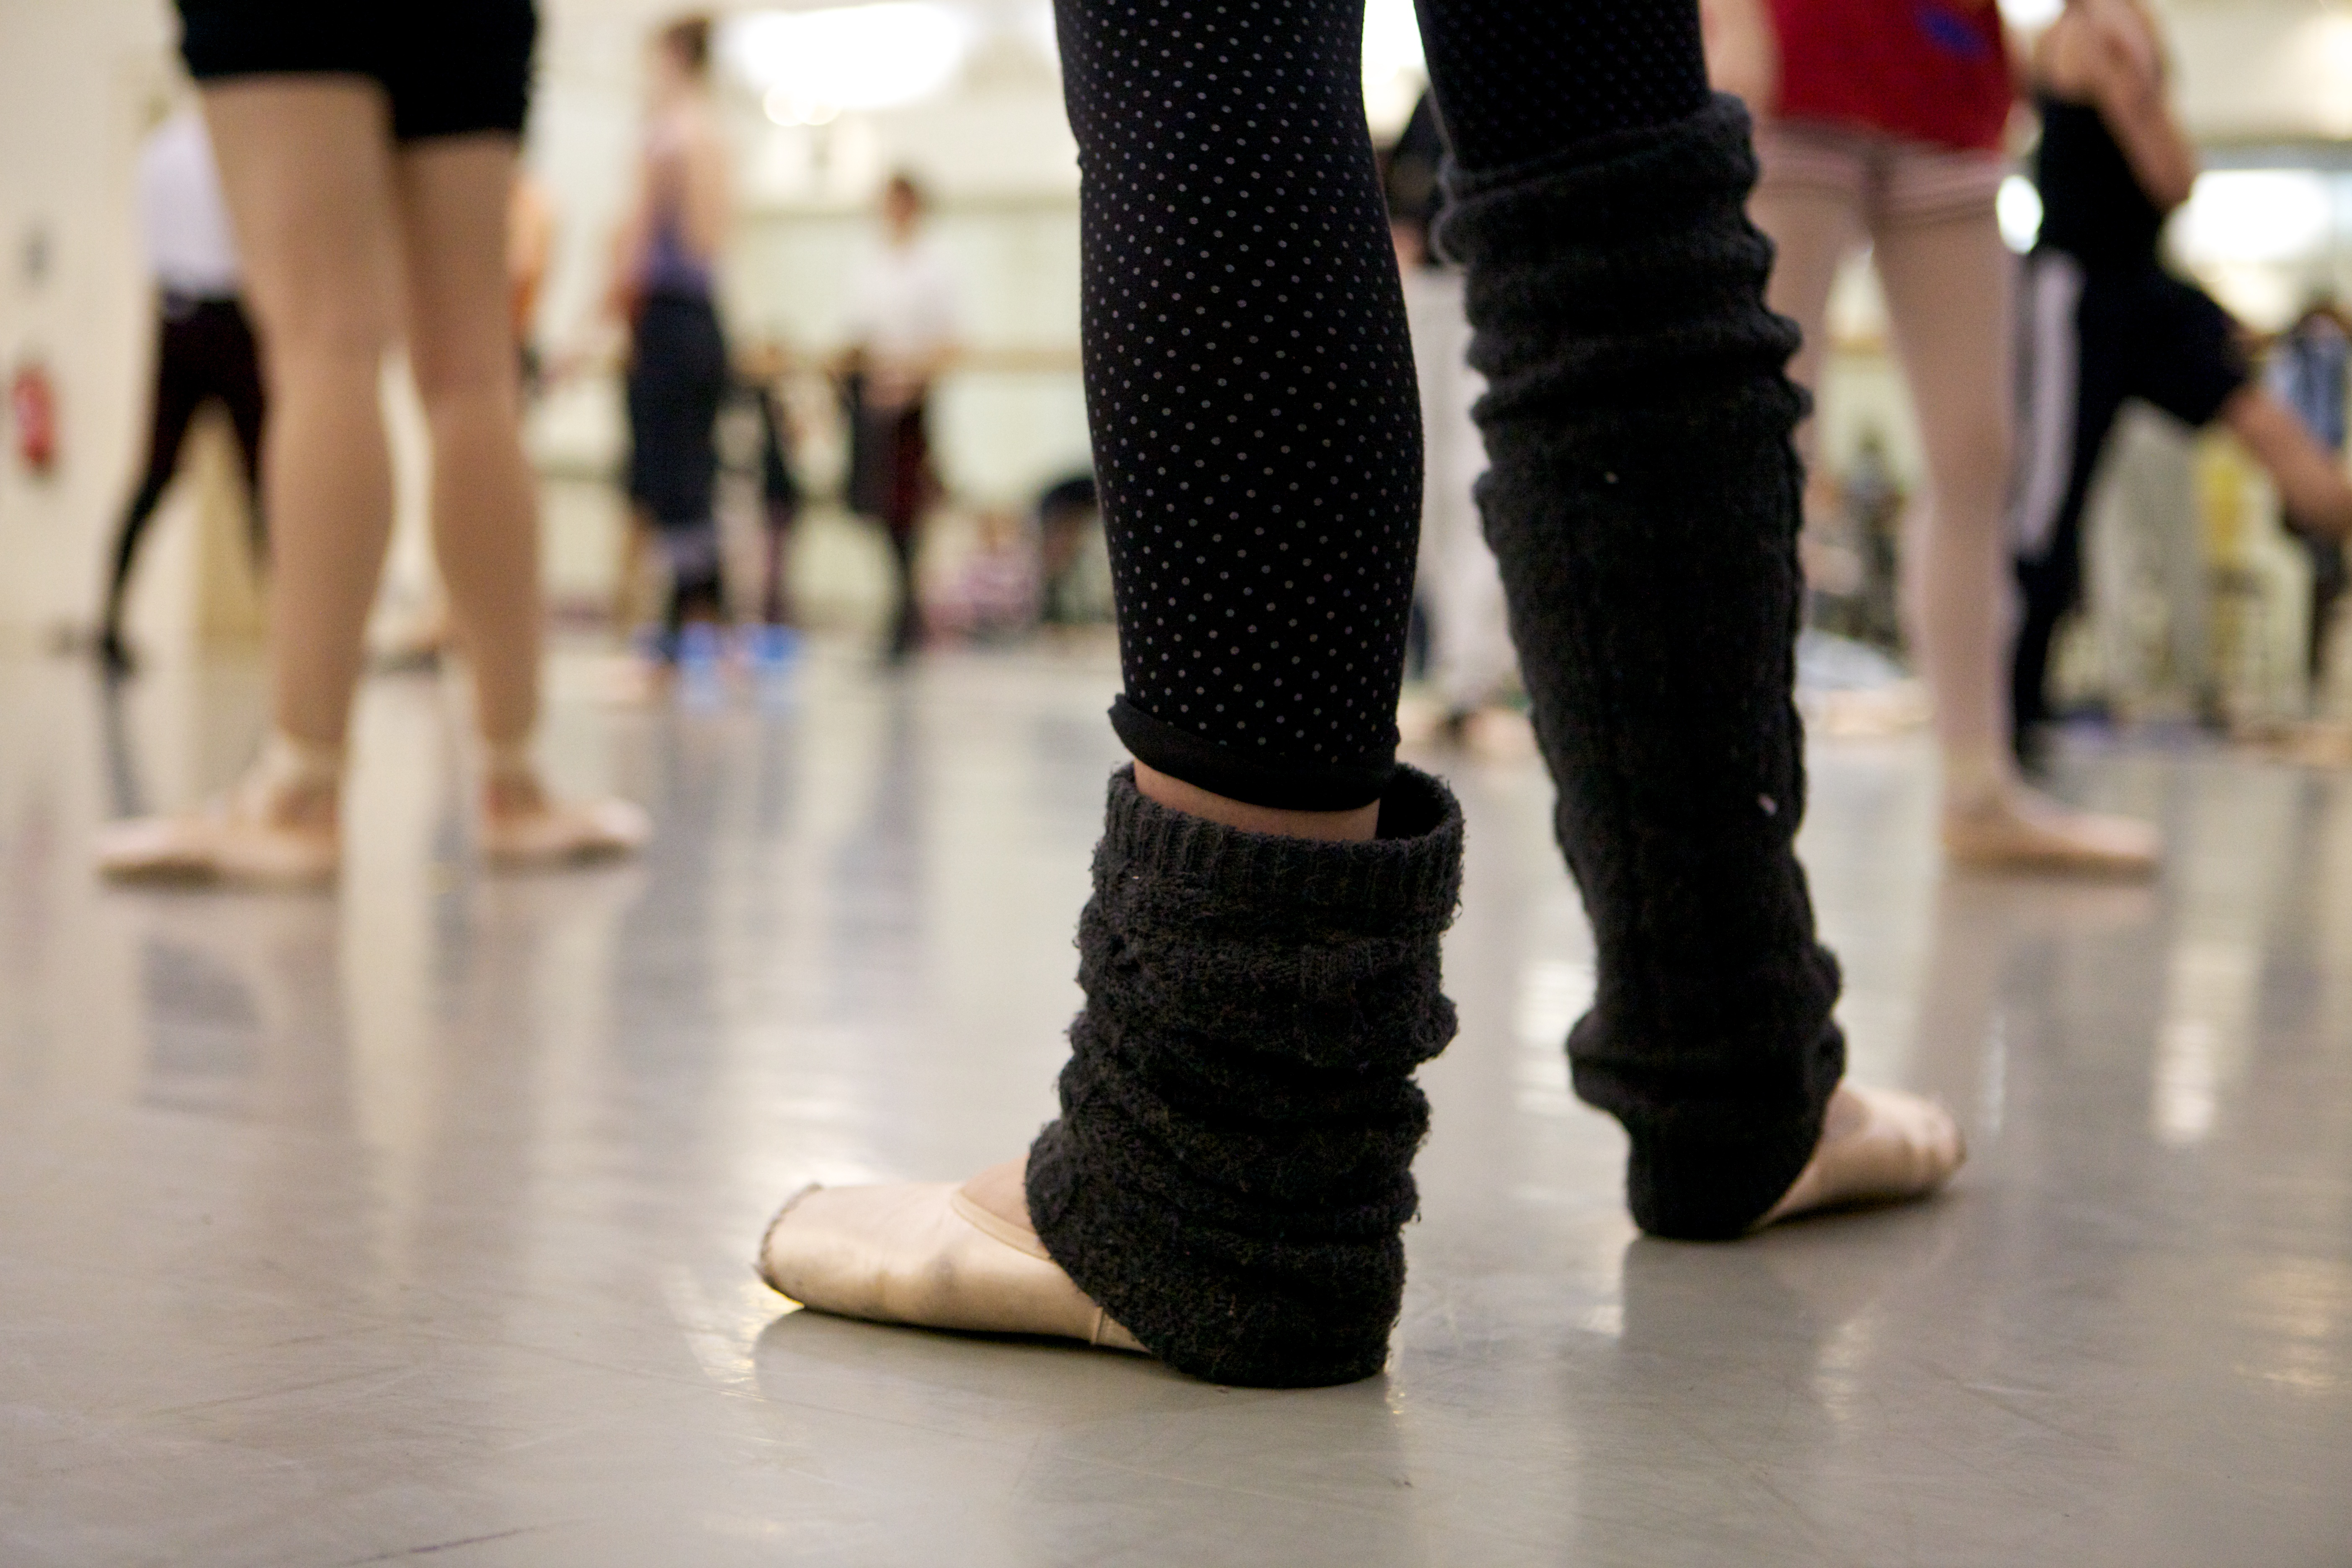 a dancer wearing legwarmers to keep her feet warm